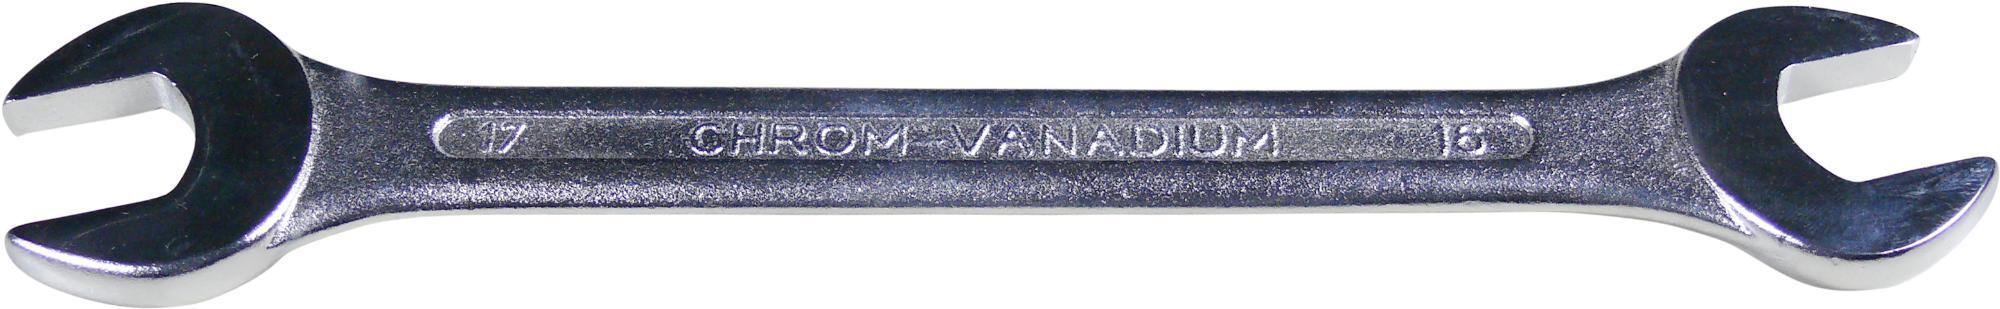 Kľúč vidlica-vidlica, 21x23 mm